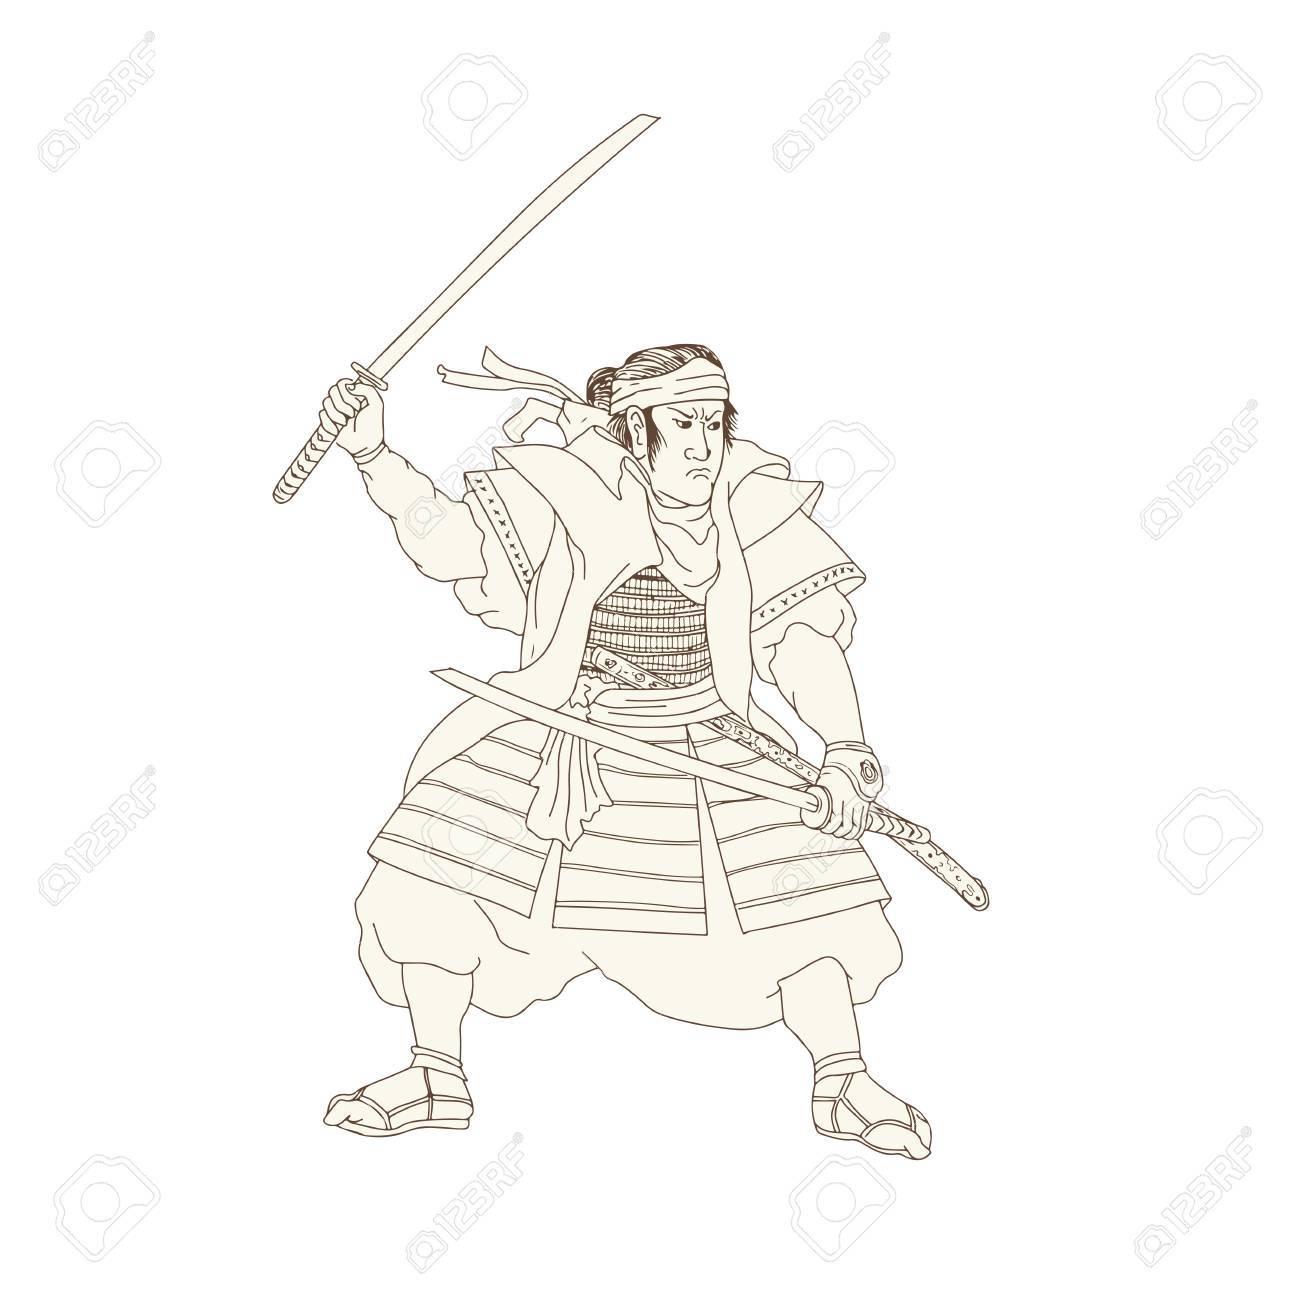 1300x1300 Woodblock Drawing Sketch Style Illustration Of Samurai Warrior